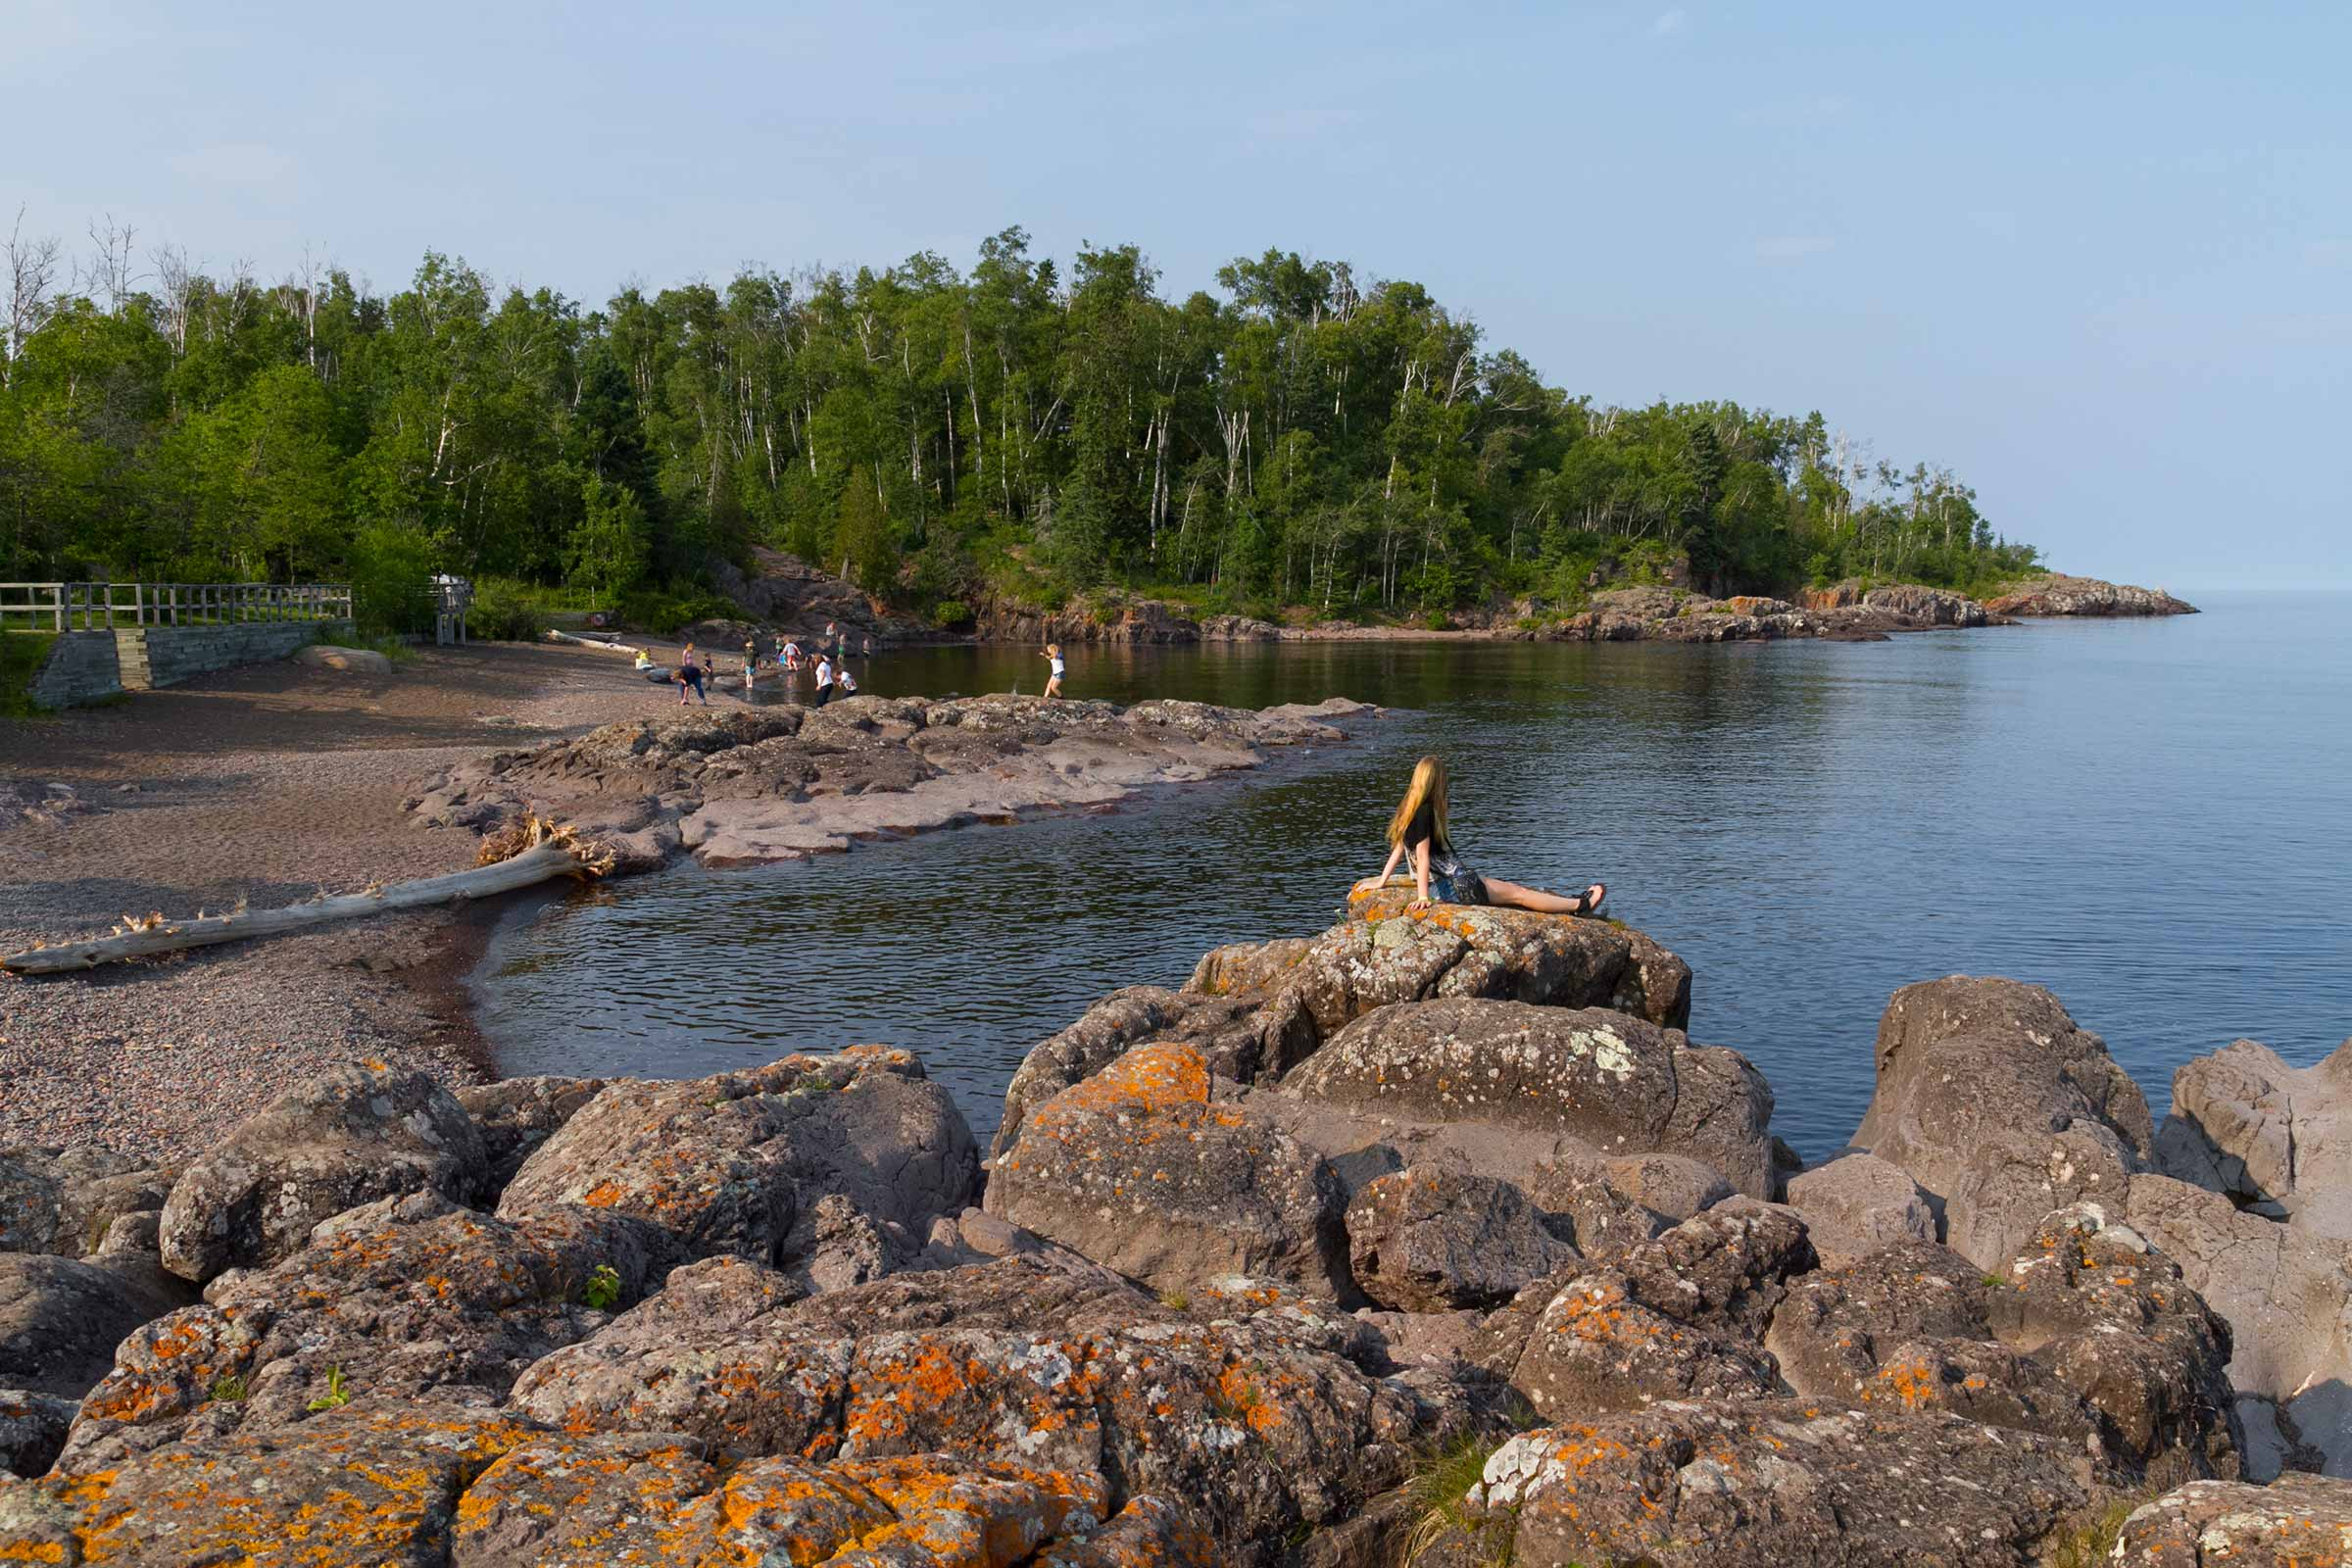 Temperance River shoreline rocks